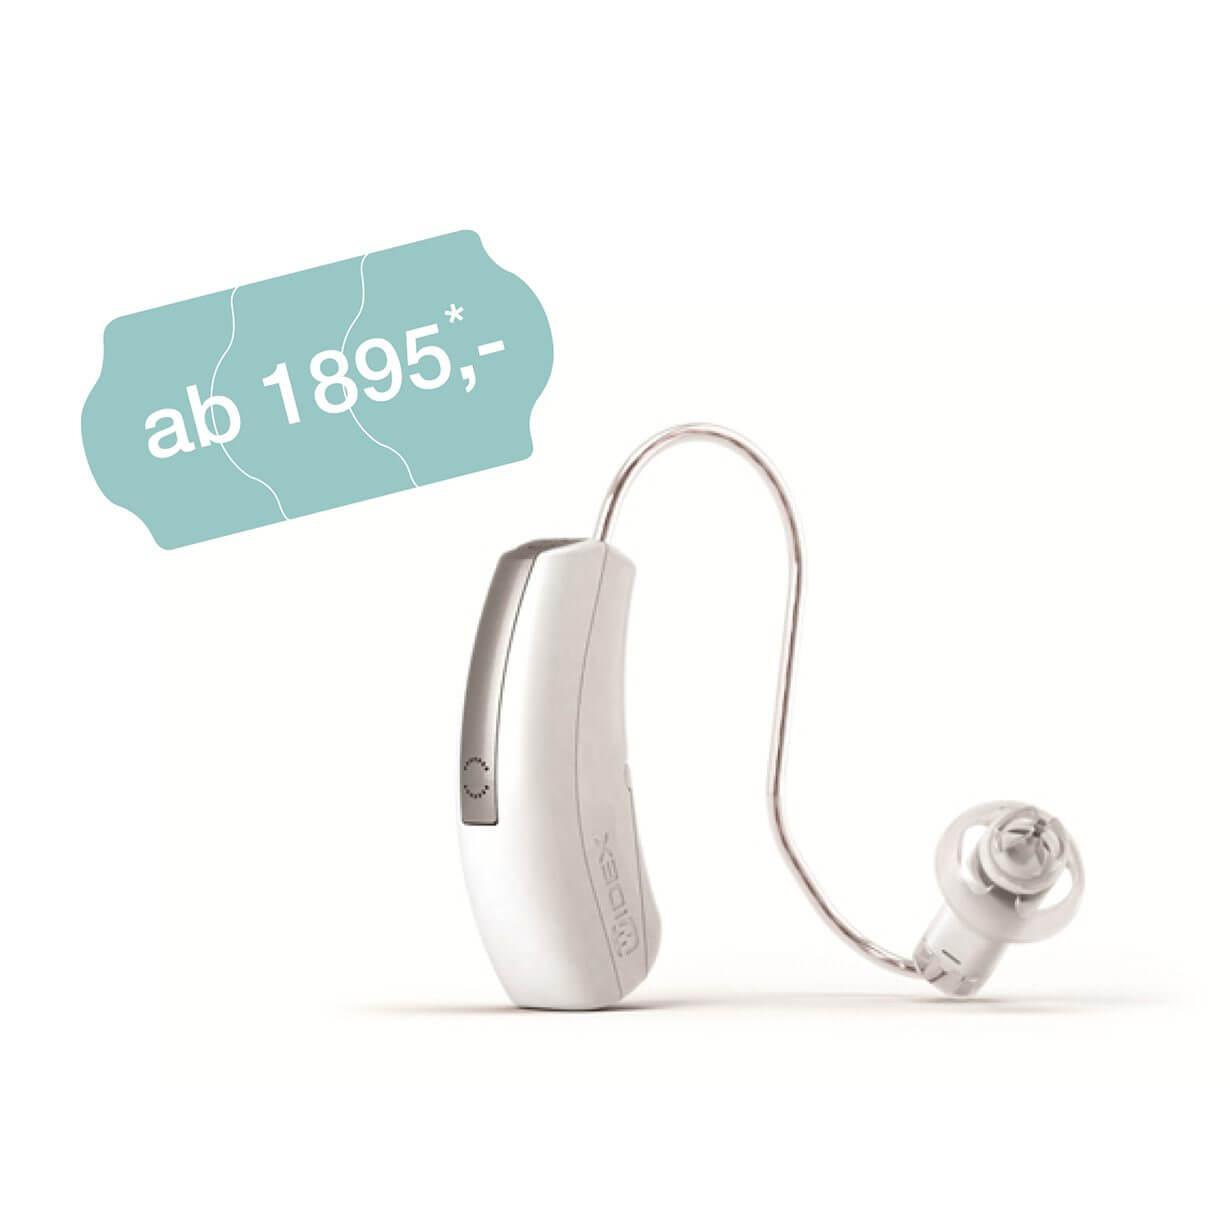 Hörgeräte-Preise_Premium _KK